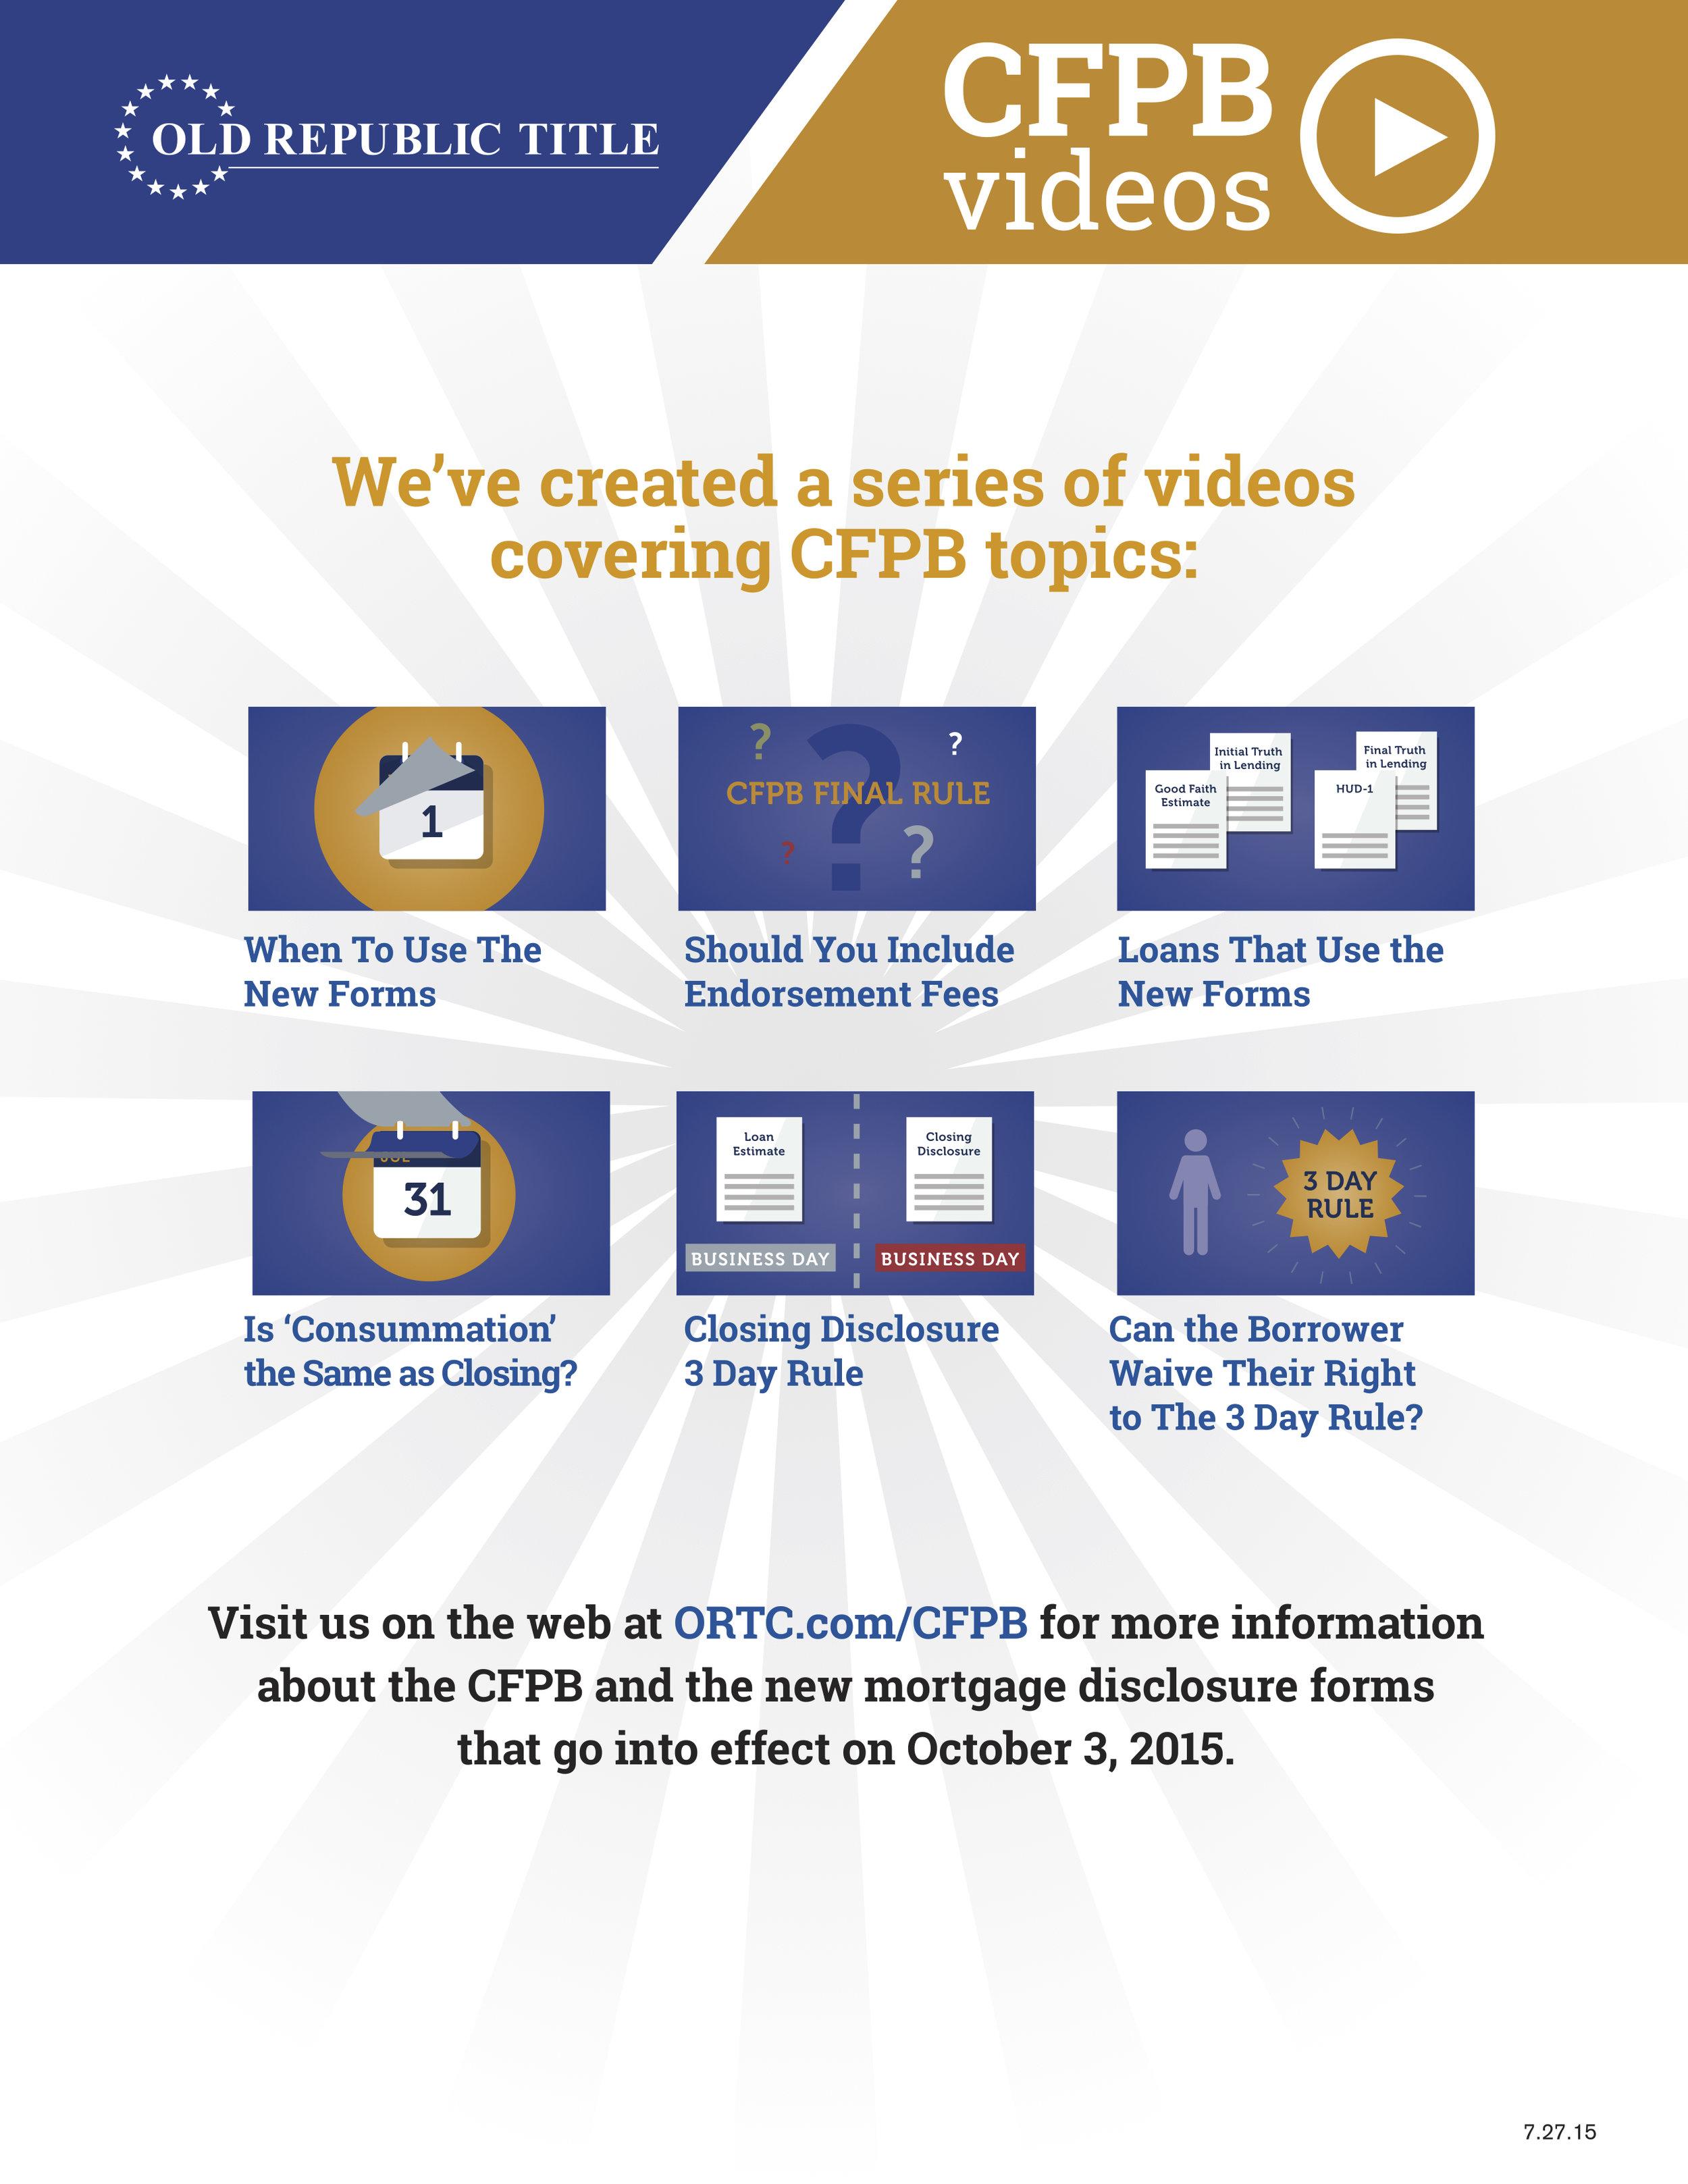 CFPB_videos.jpg